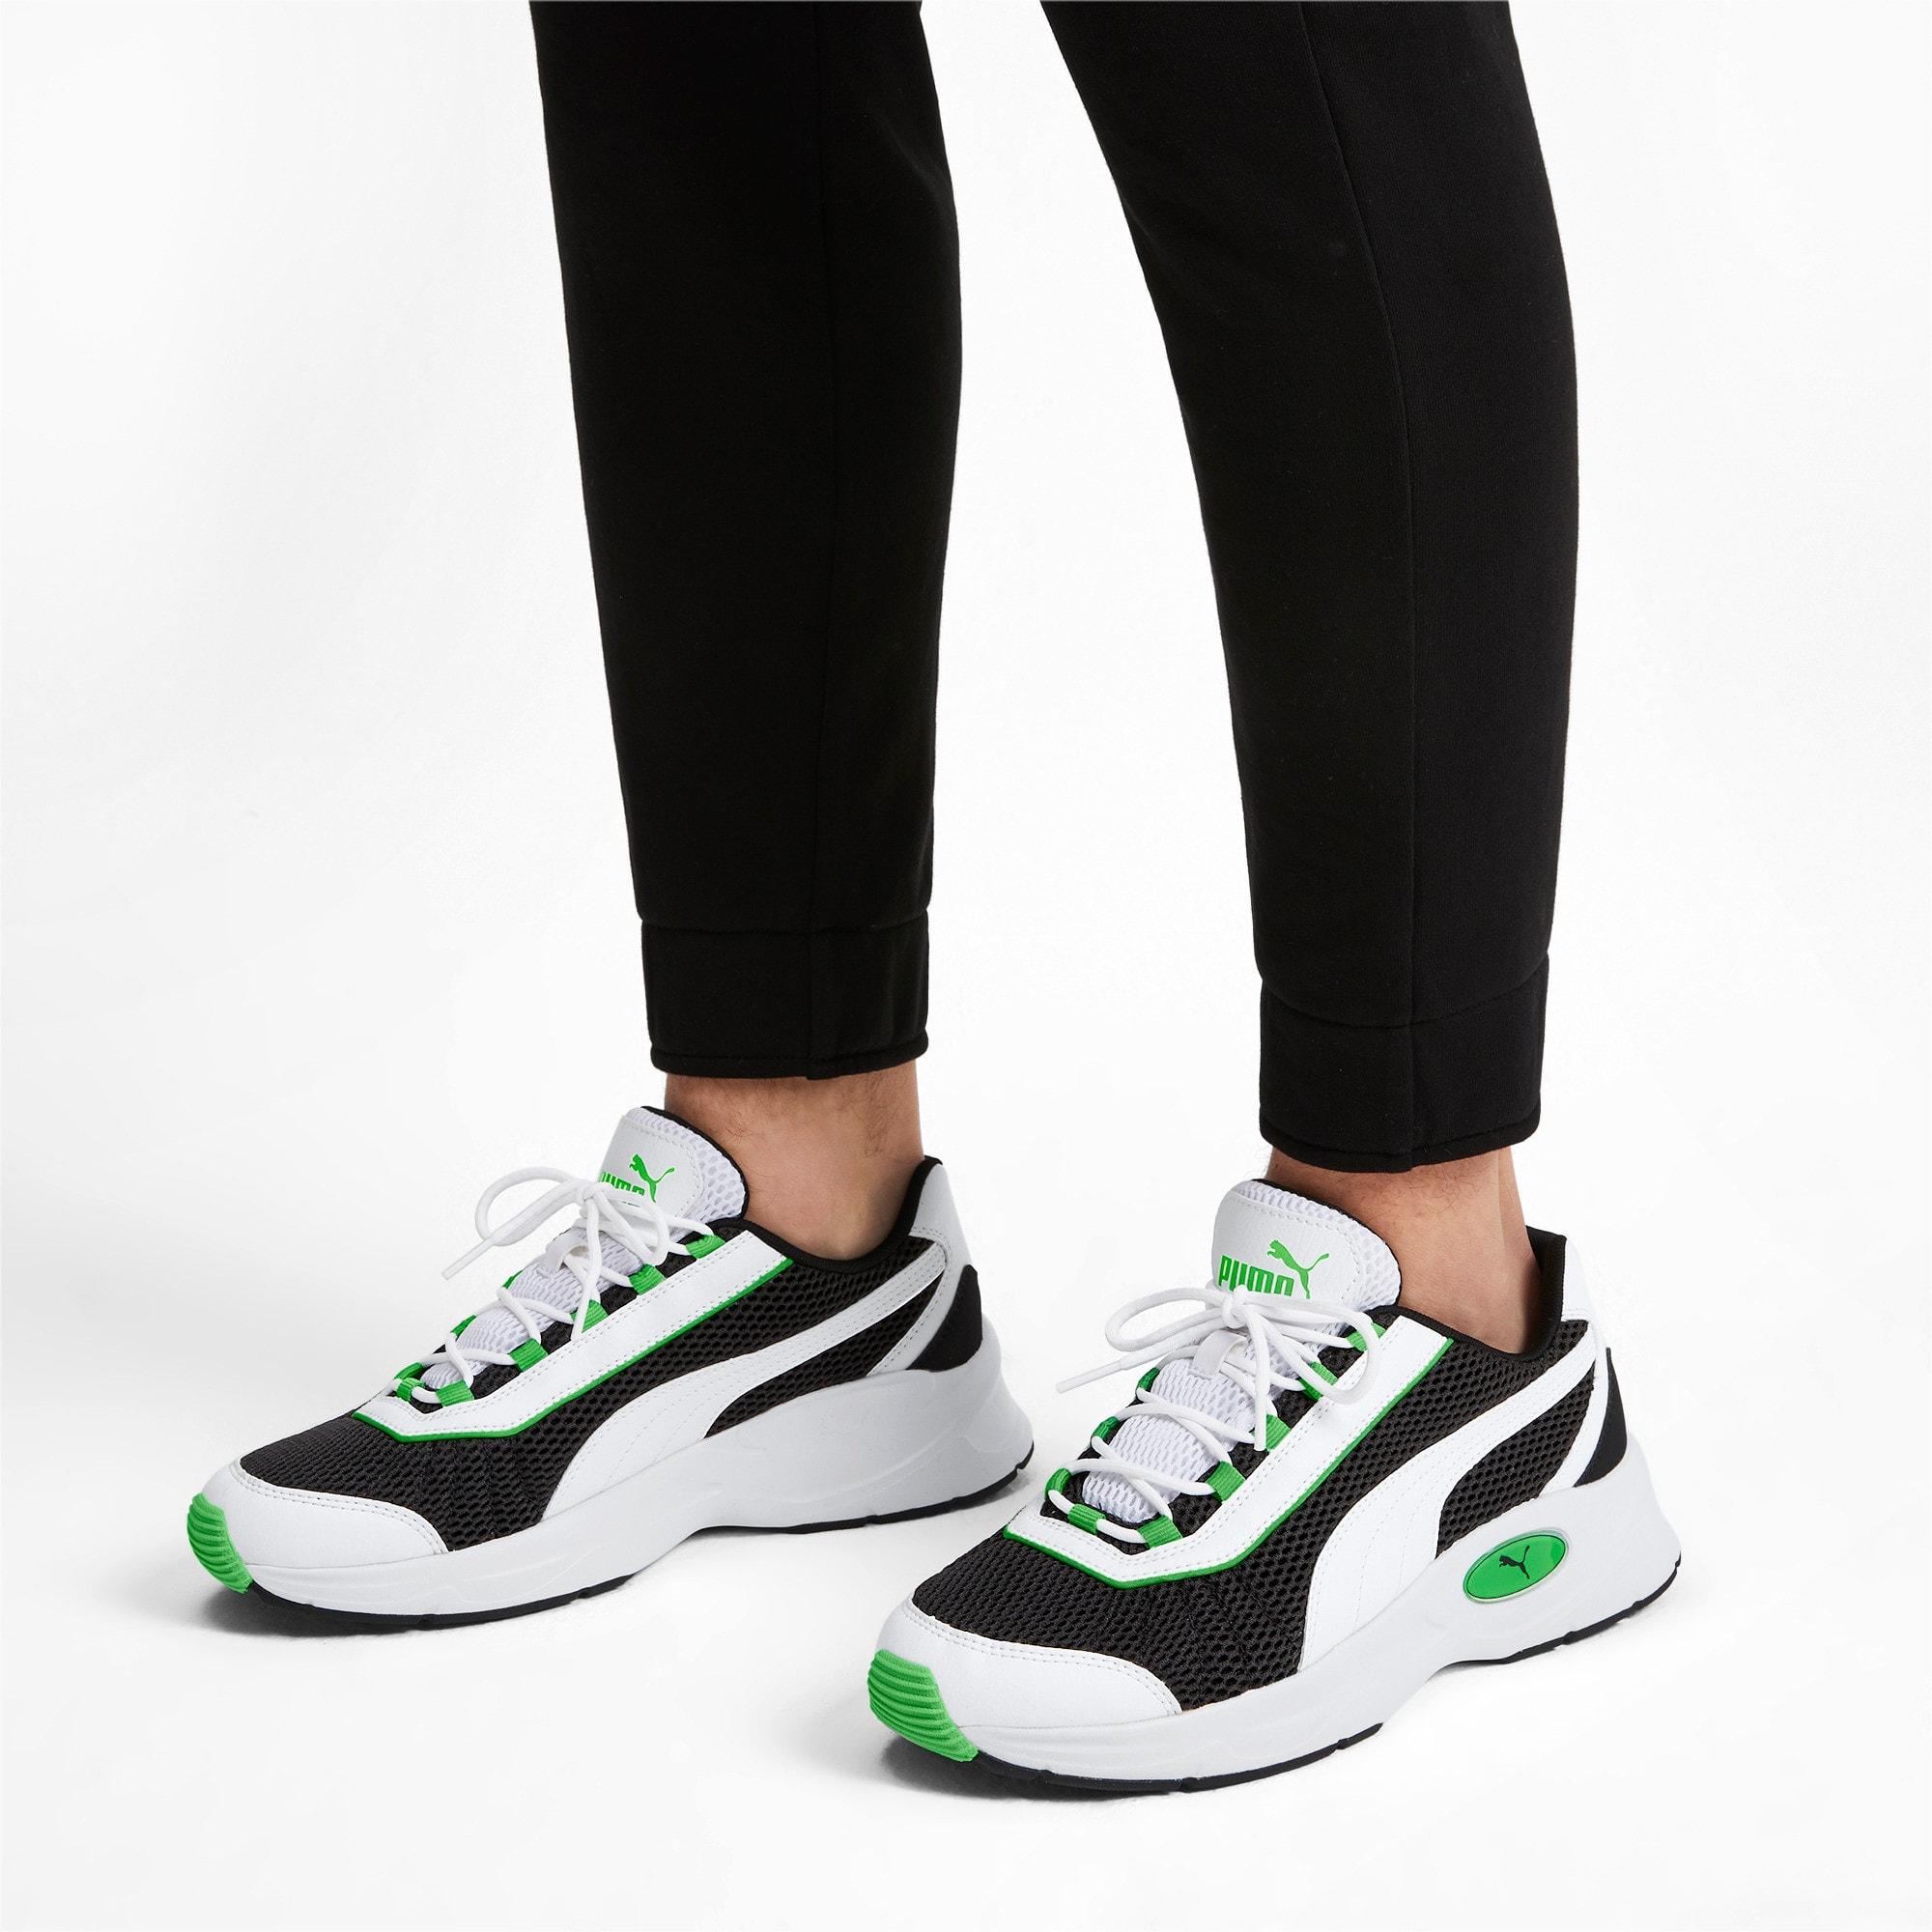 Imagen en miniatura 2 de Zapatillas de training Nucleus, Puma Black-Classic Green, mediana